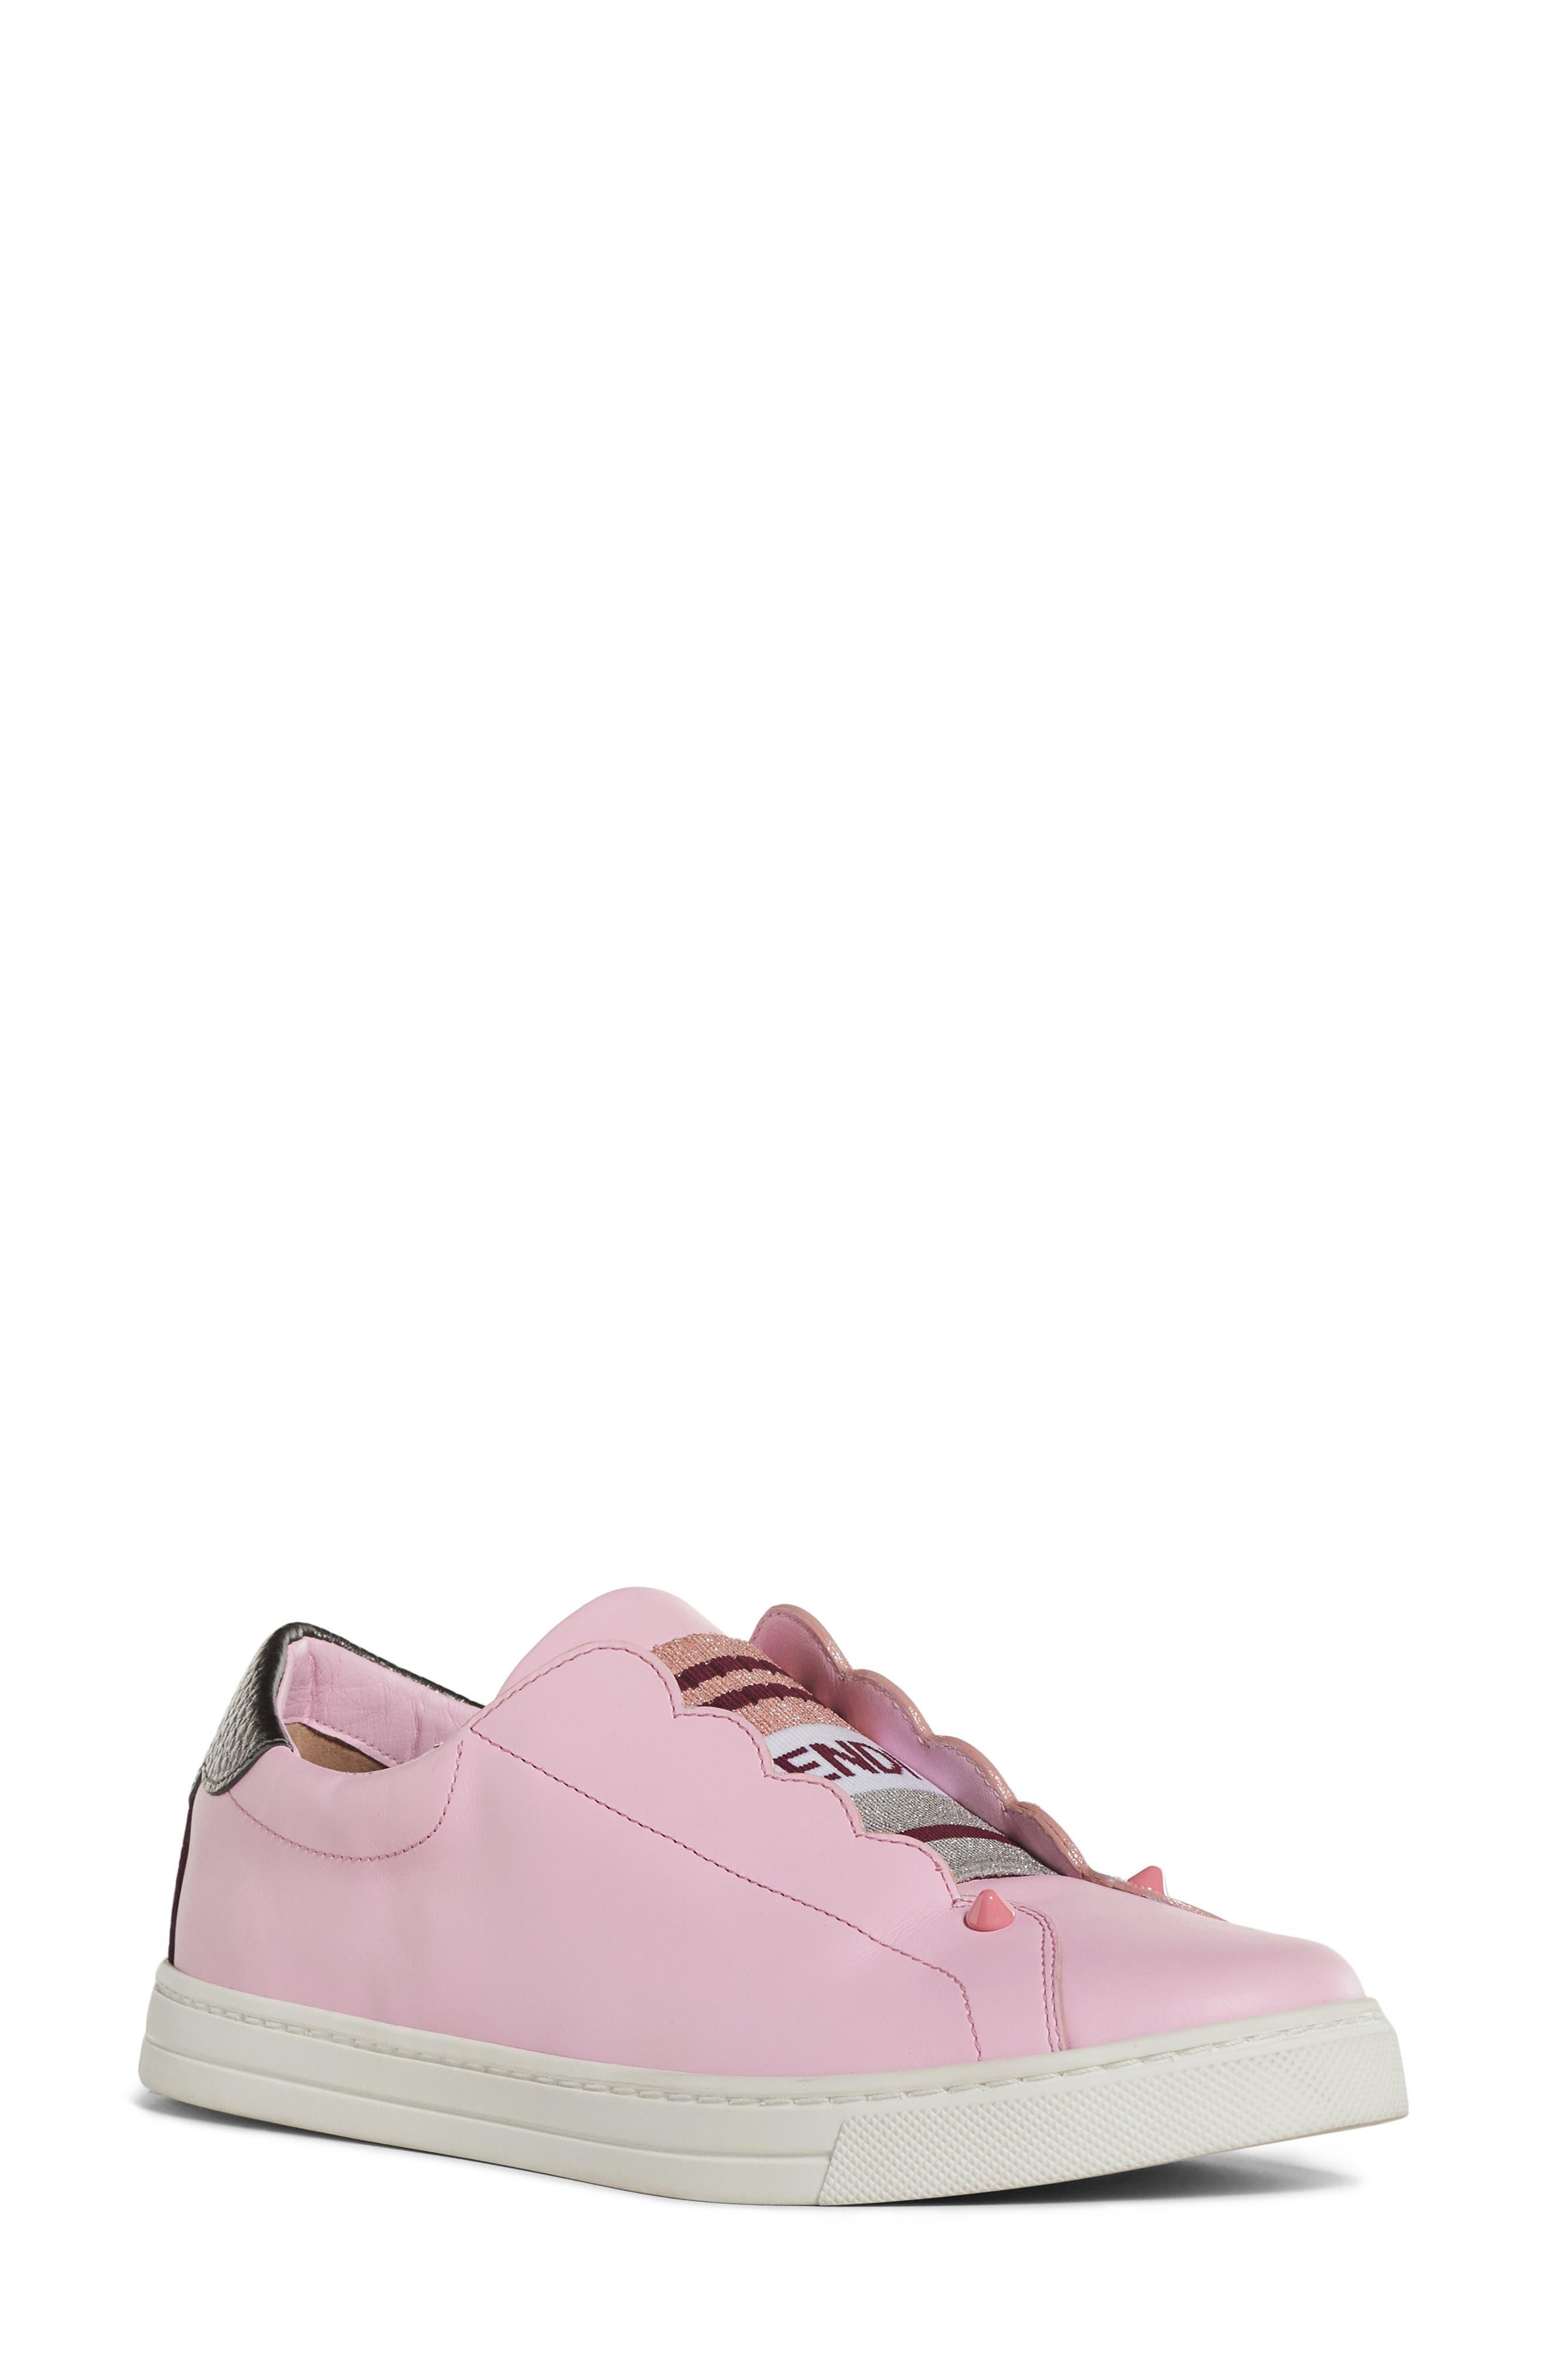 Rockoko Slip-On Sneaker,                         Main,                         color, 650